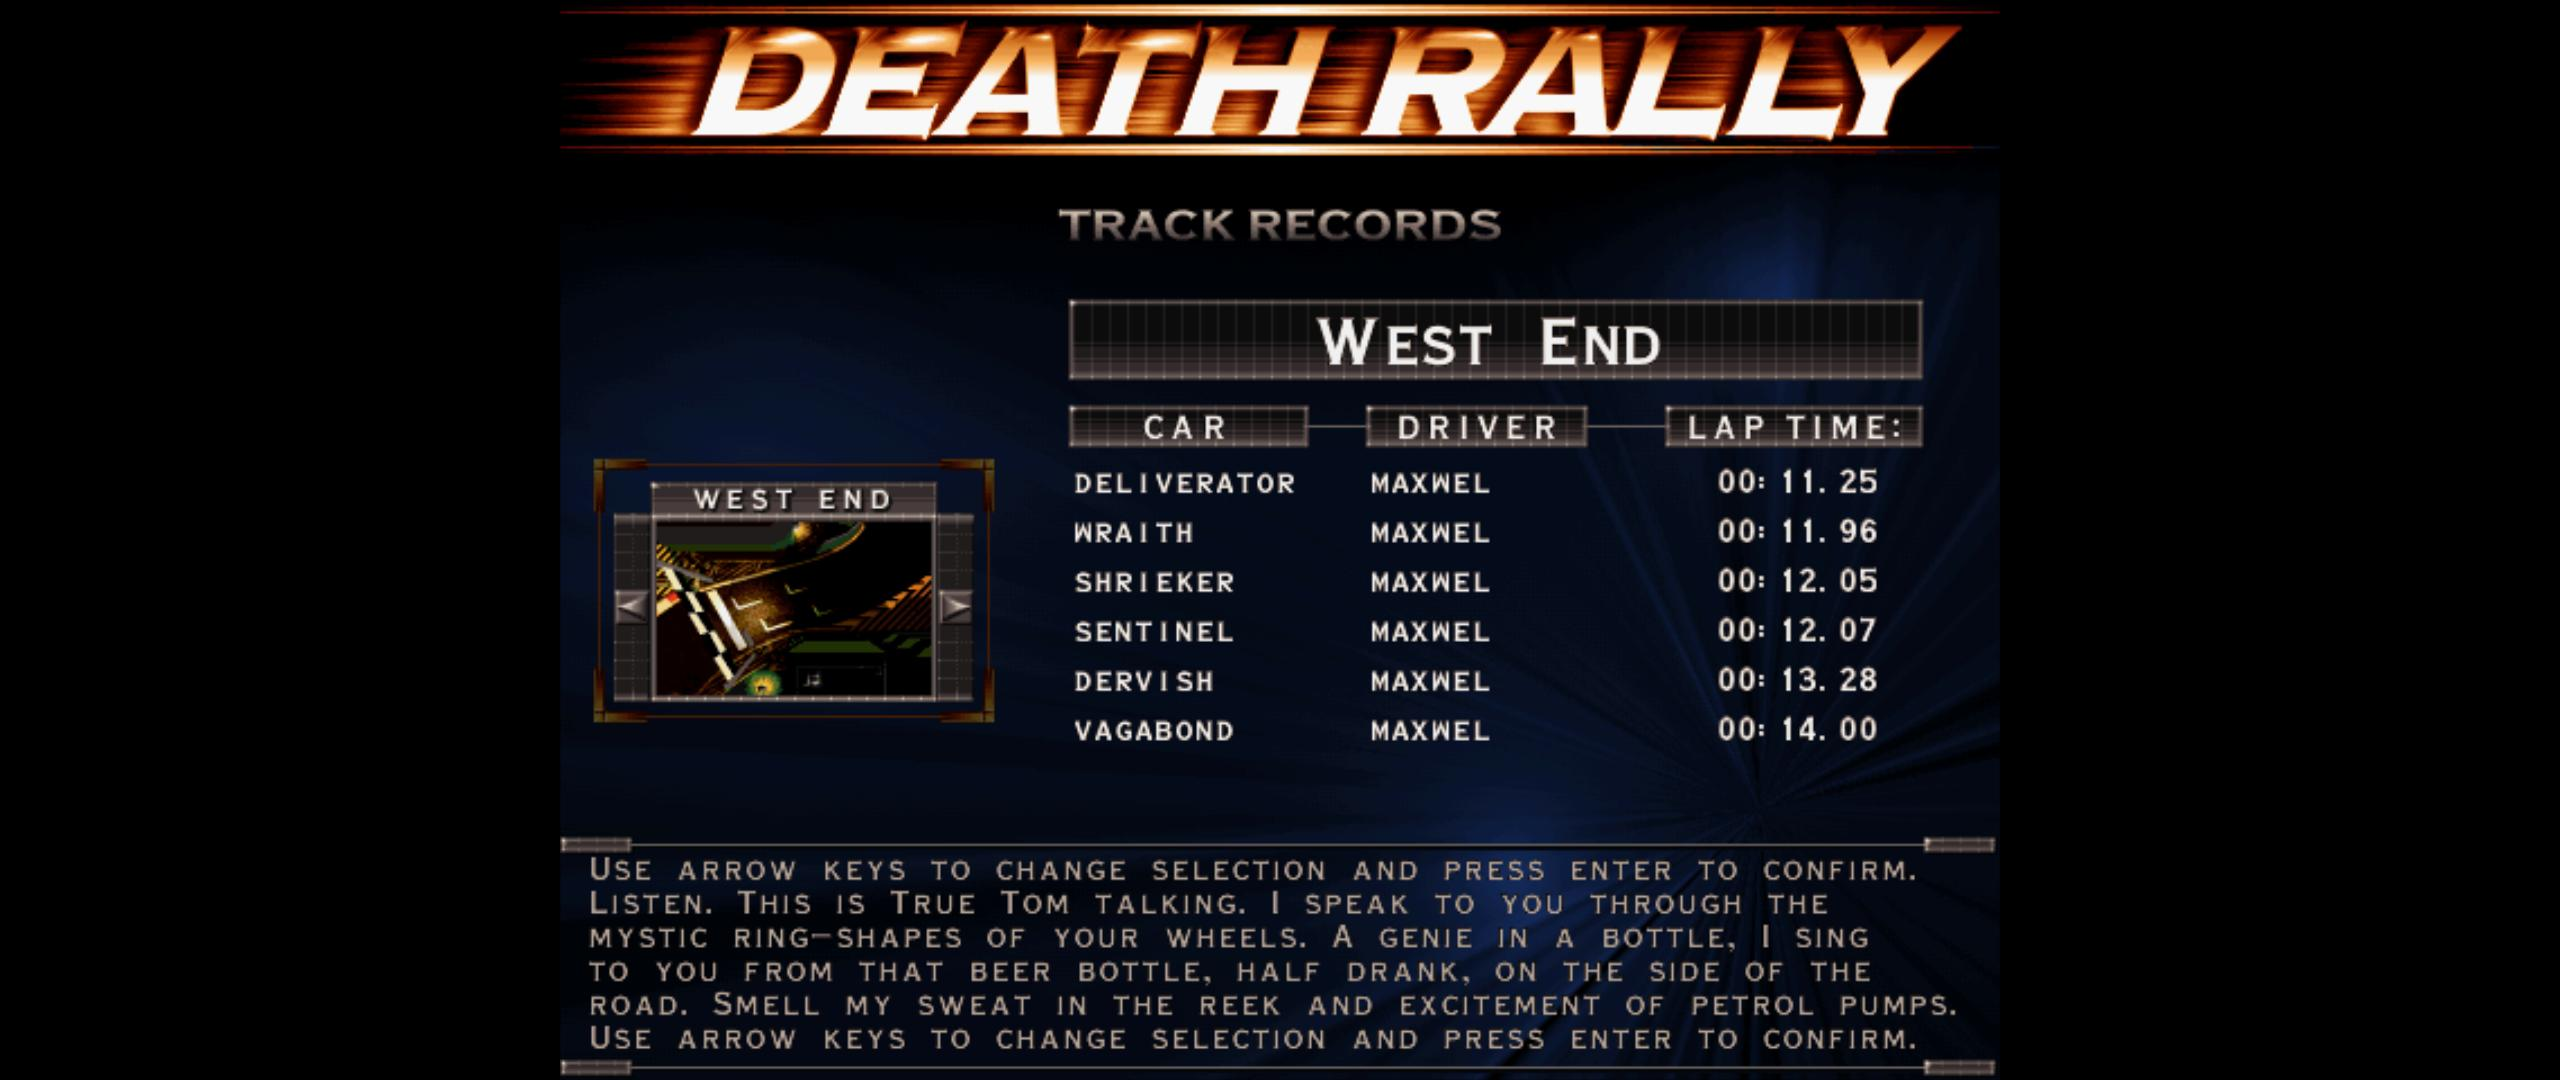 Maxwel: Death Rally [West End, Dervish Car Car] (PC) 0:00:13.28 points on 2016-03-04 05:37:29